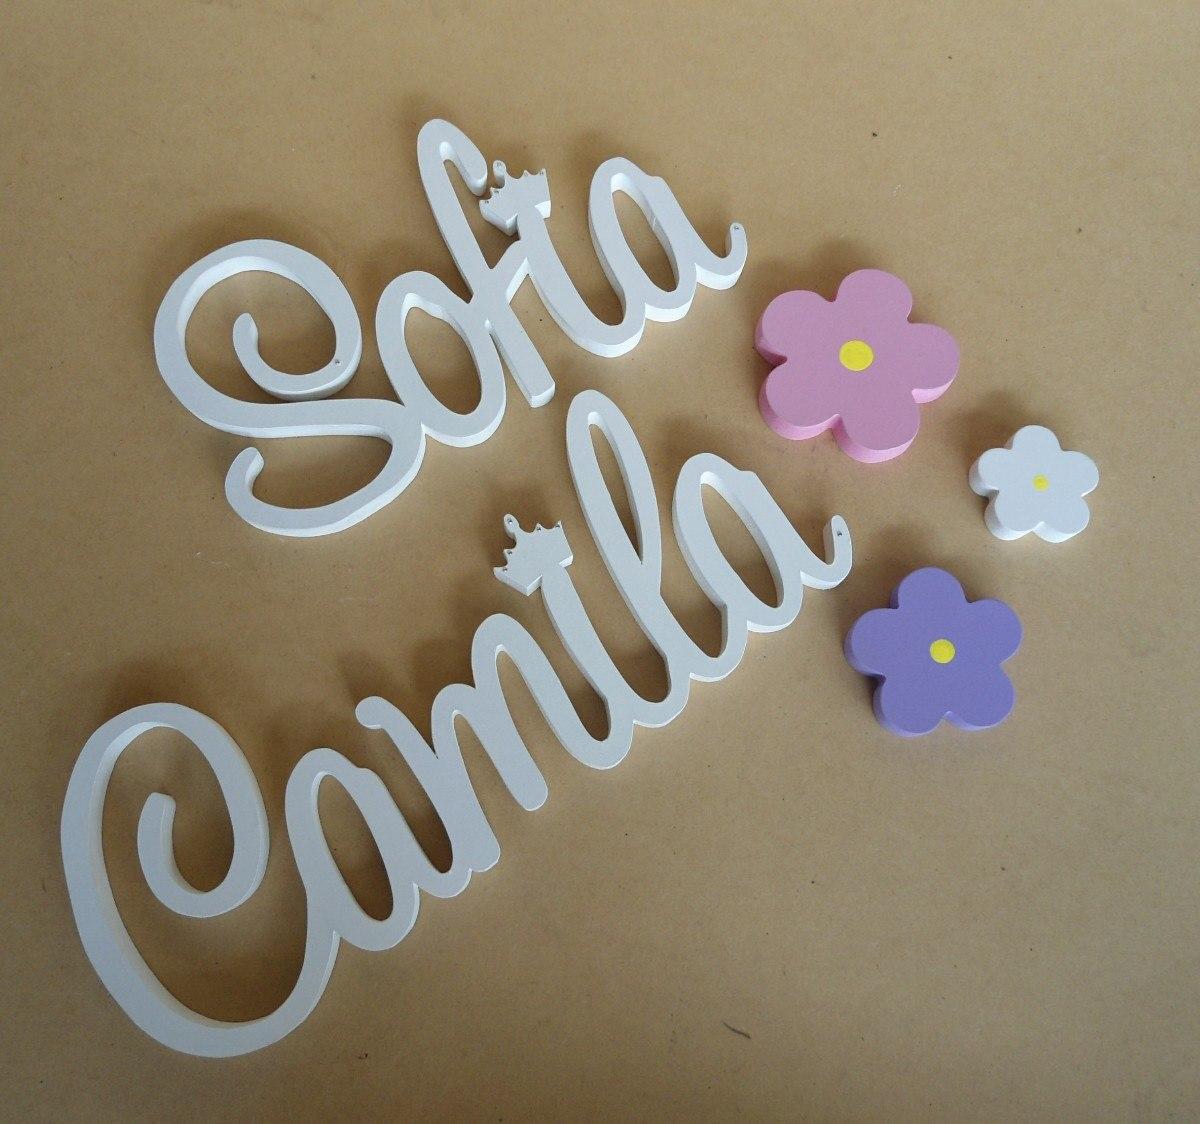 Letras nombres corridos pintados mdf madera pared candy for Decoracion en mdf para pared